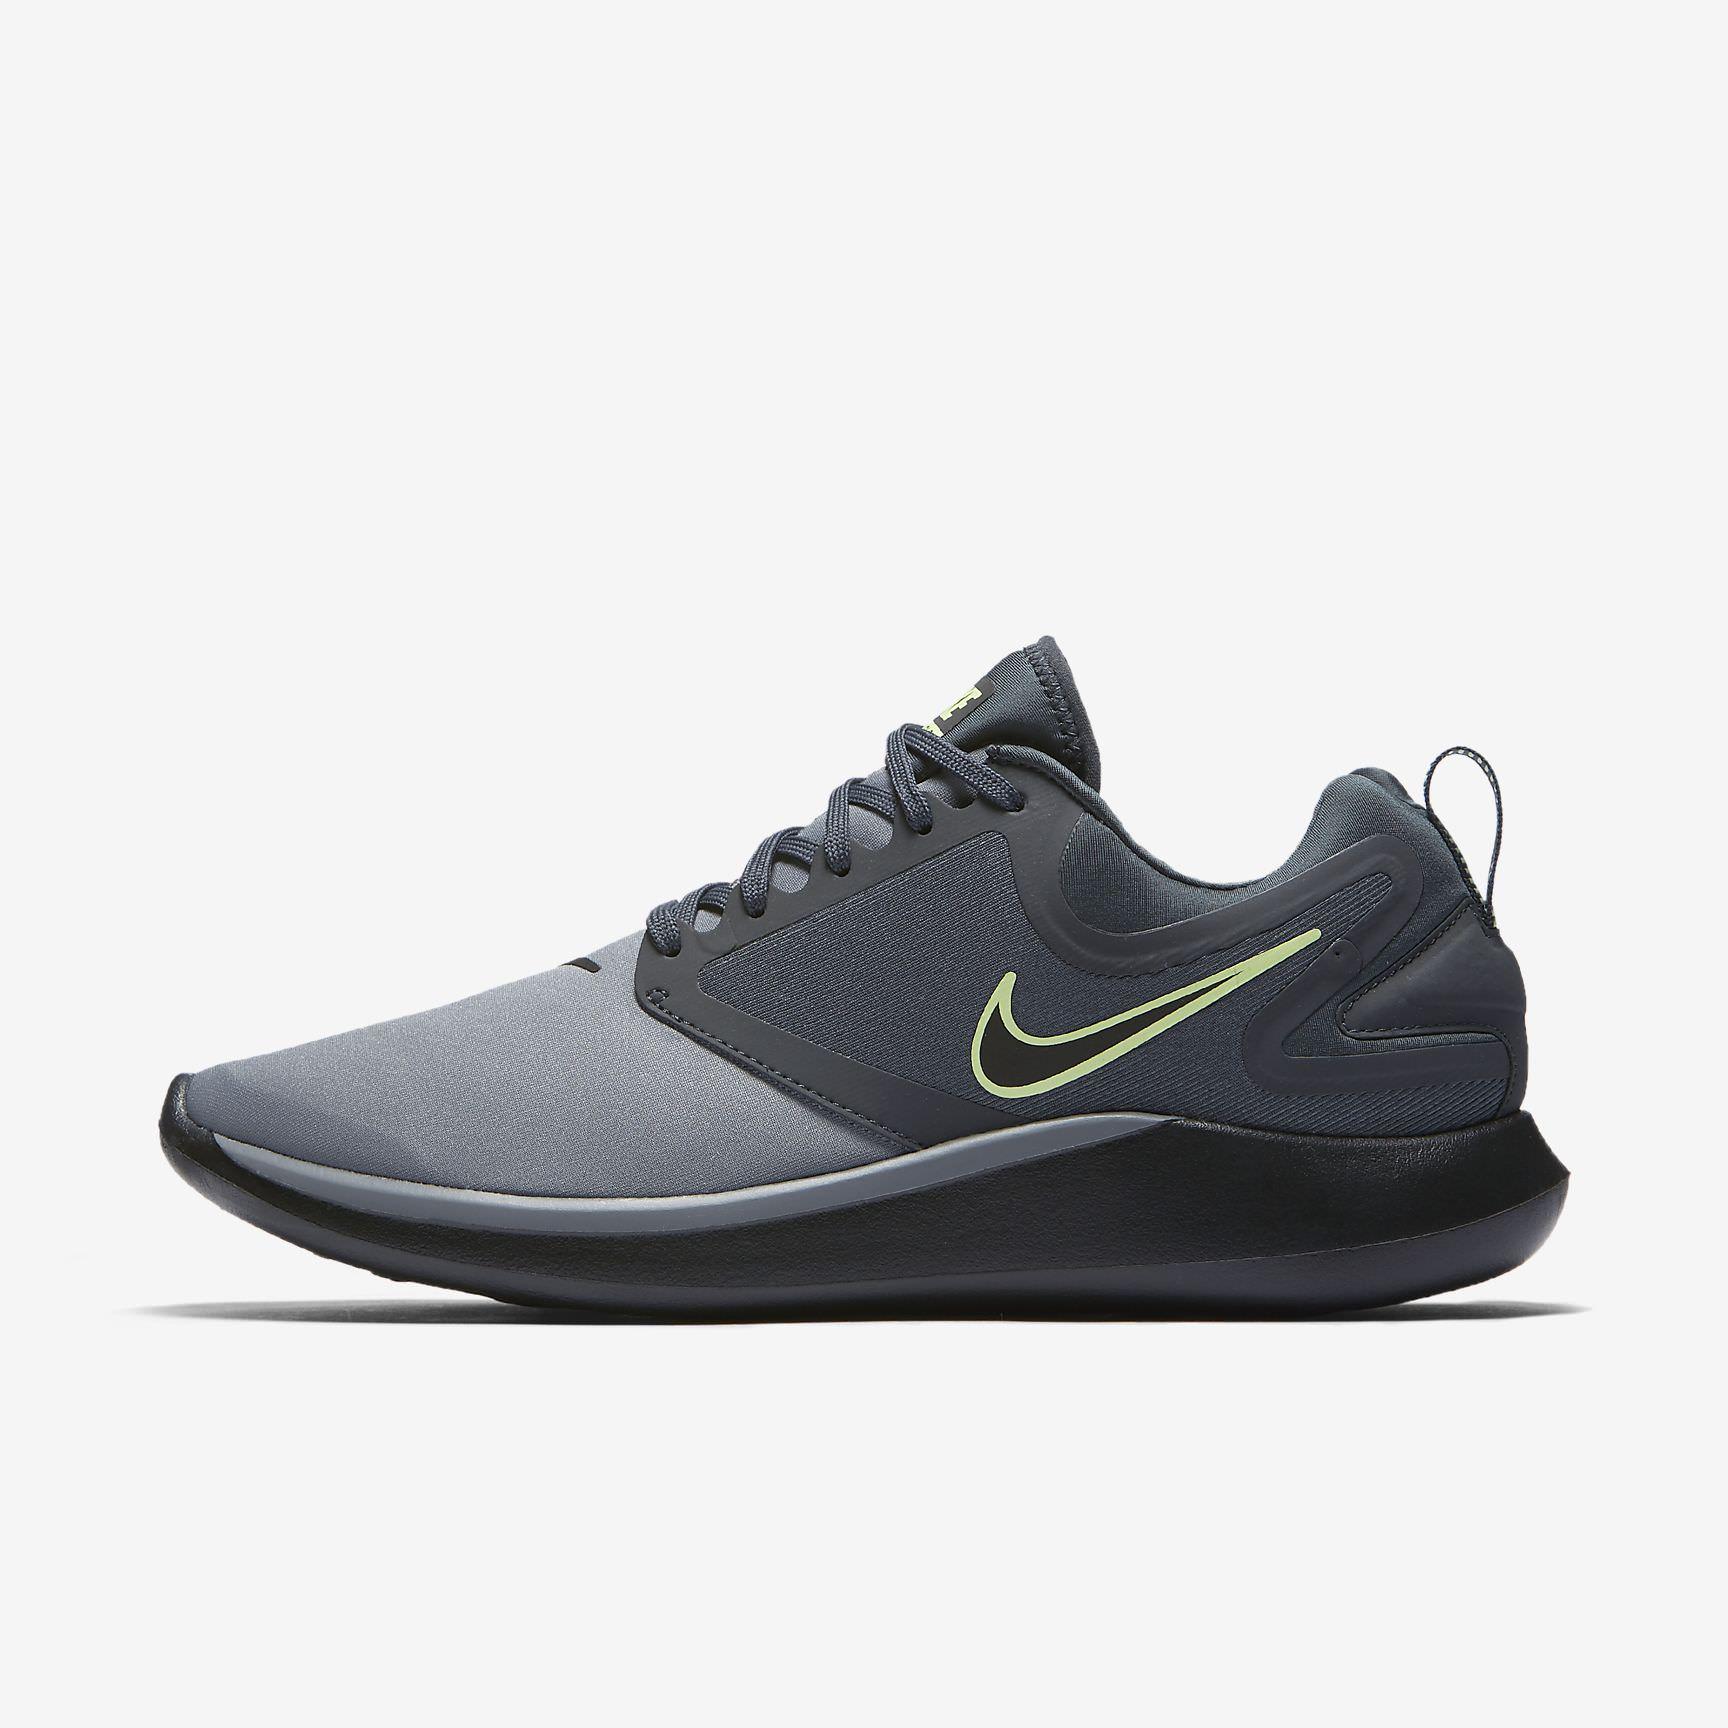 Nike LunarSolo Training Shoe